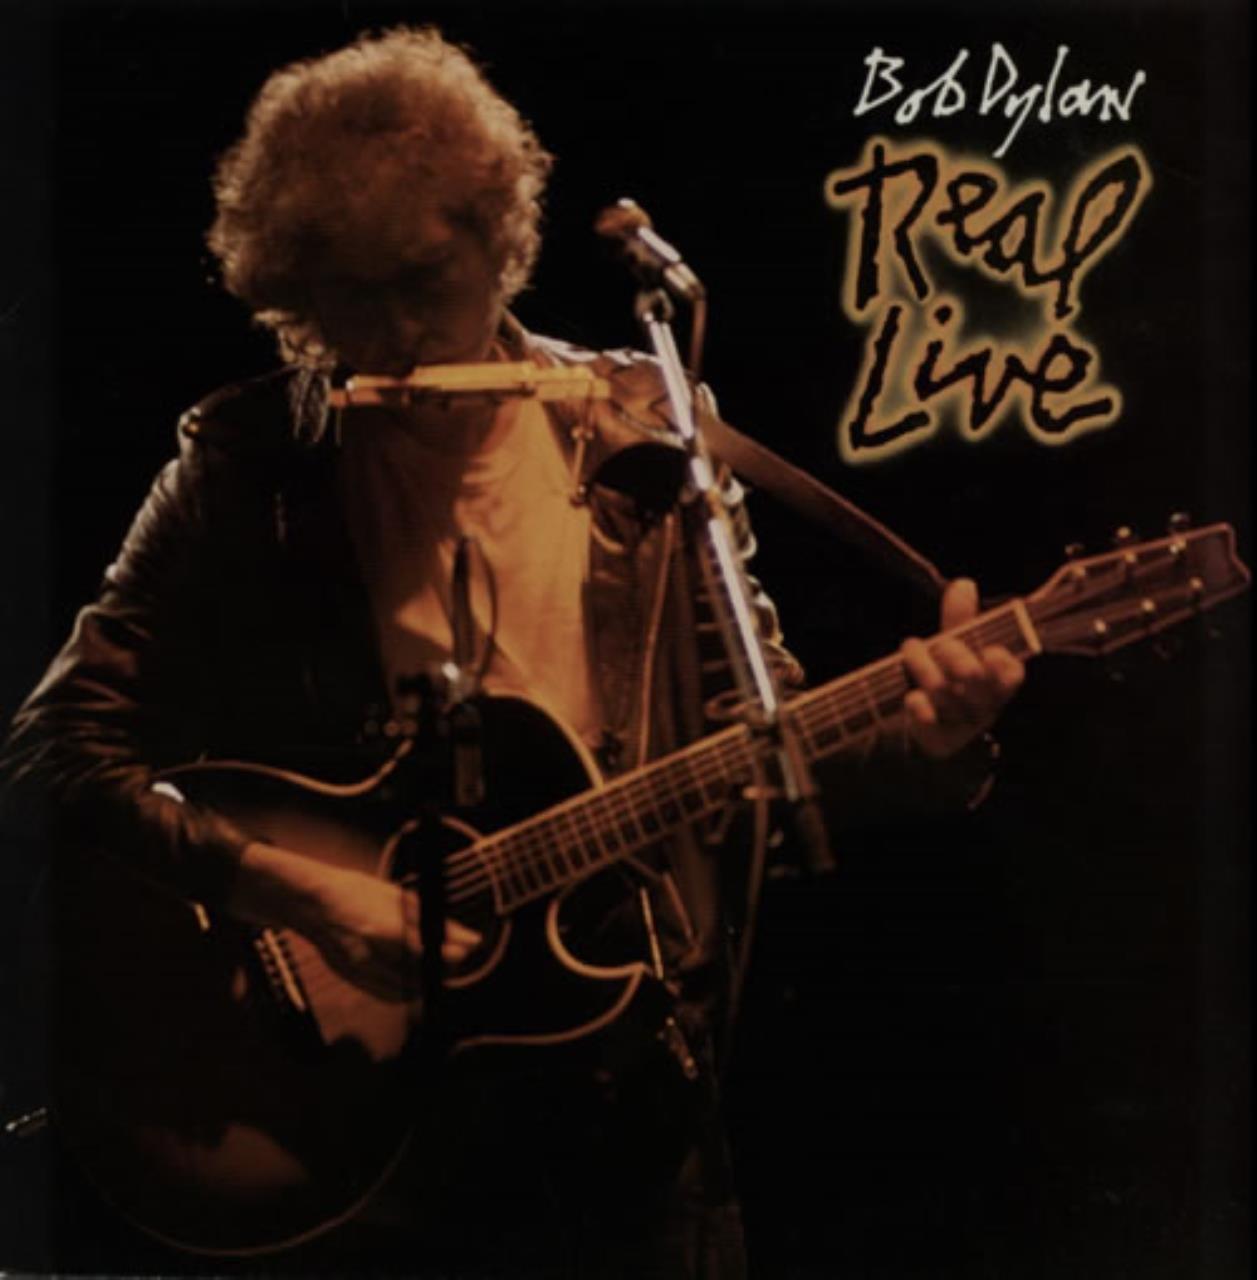 Real Live - Bob Dylan - Musik - SONY MUSIC CG - 0190758469614 - 20/9-2019